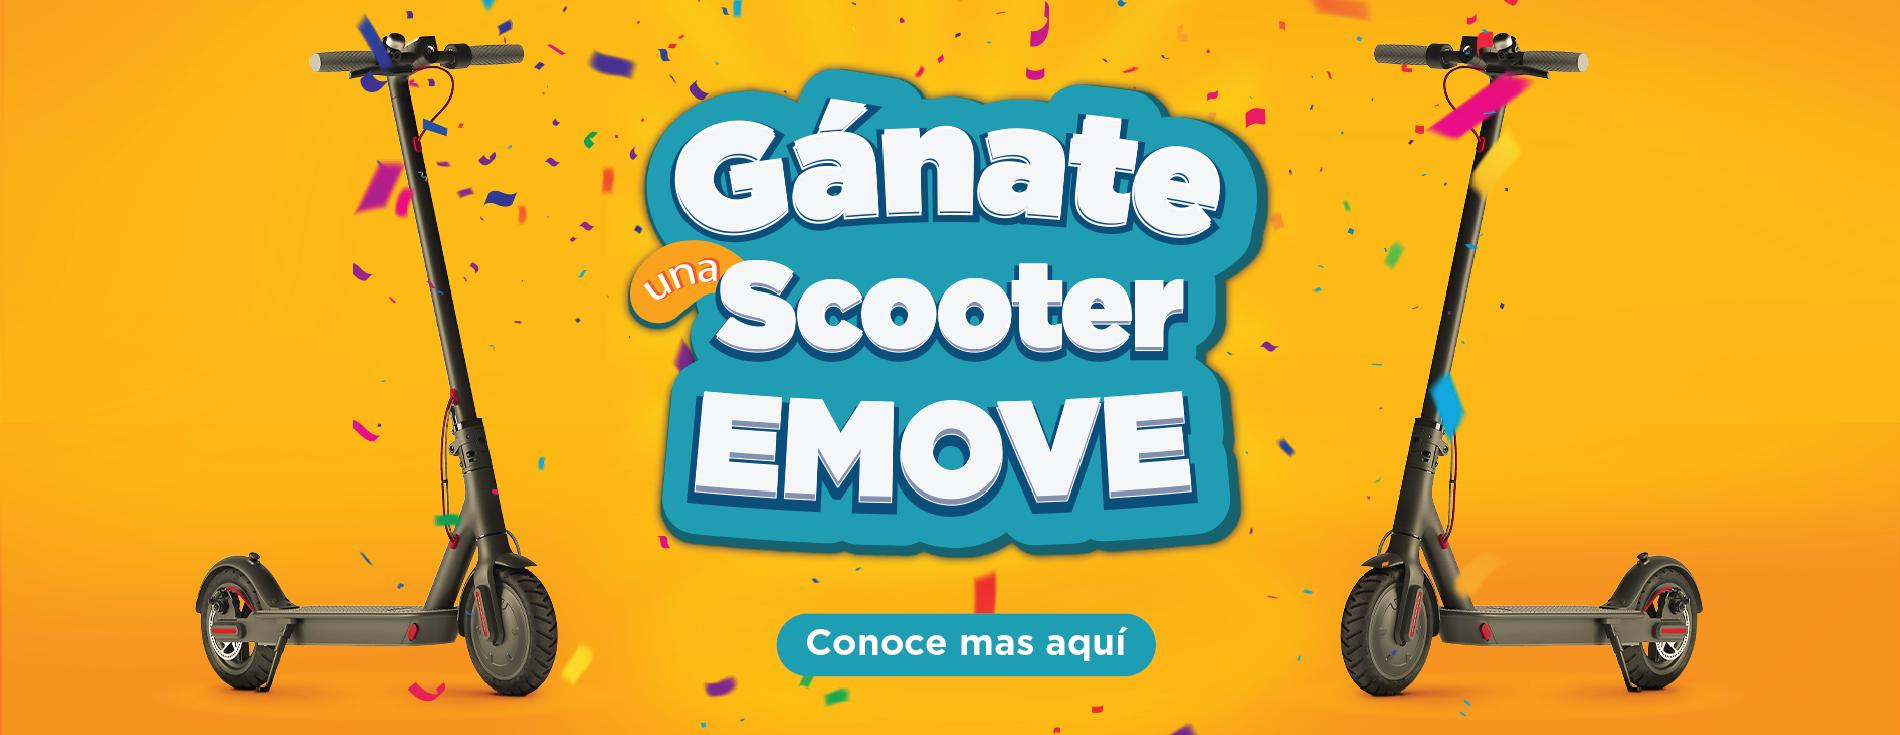 Gánate una Scooter EMOVE - Fontibón